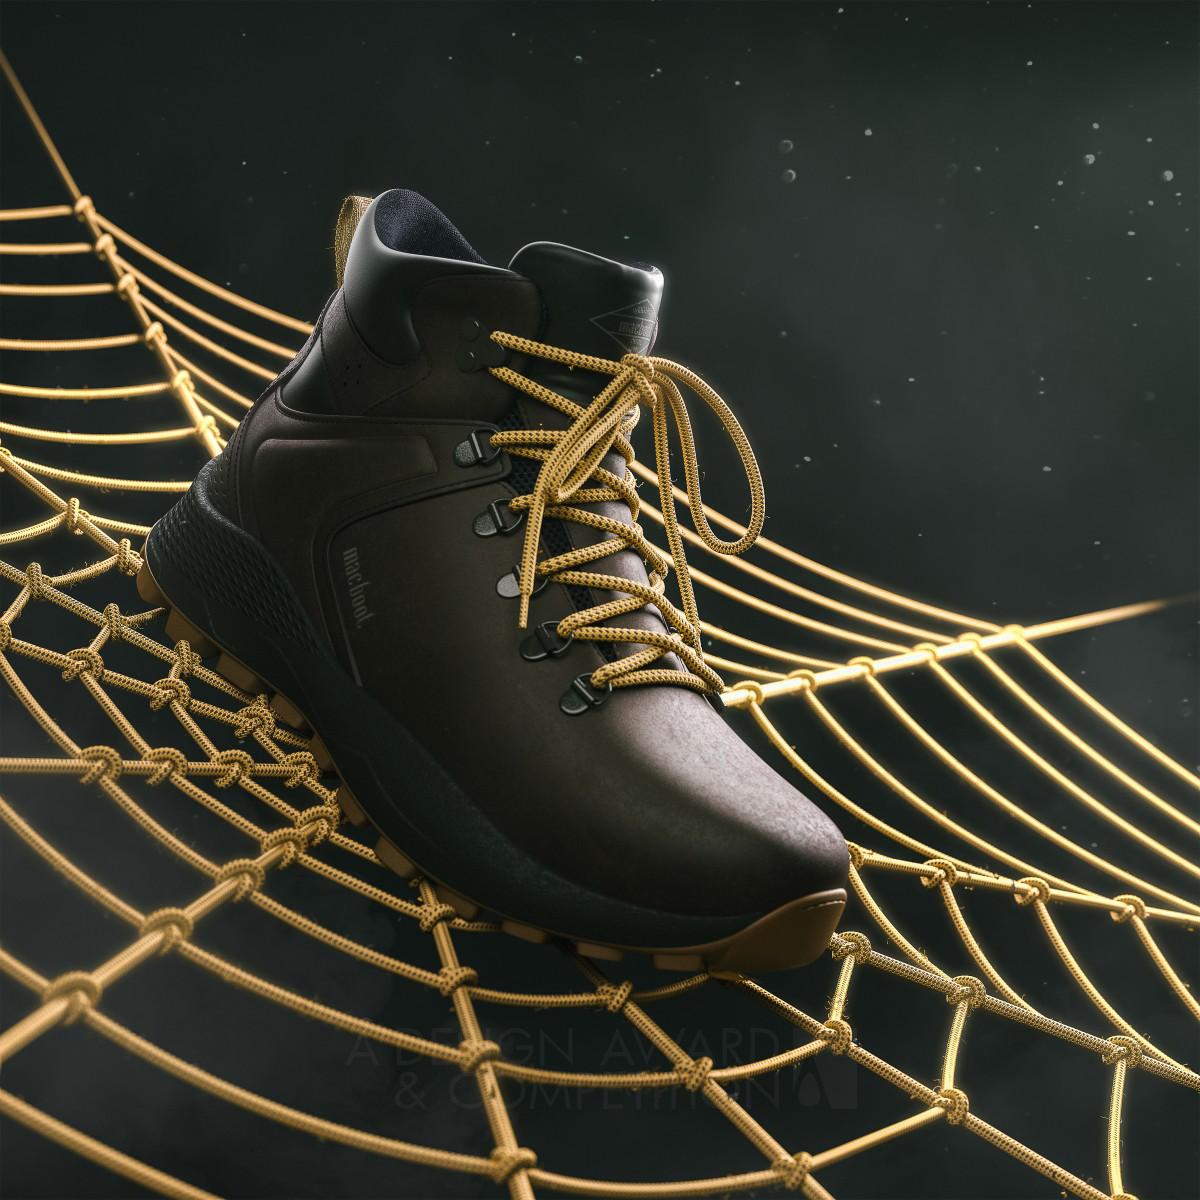 Spiderweb Key Visual